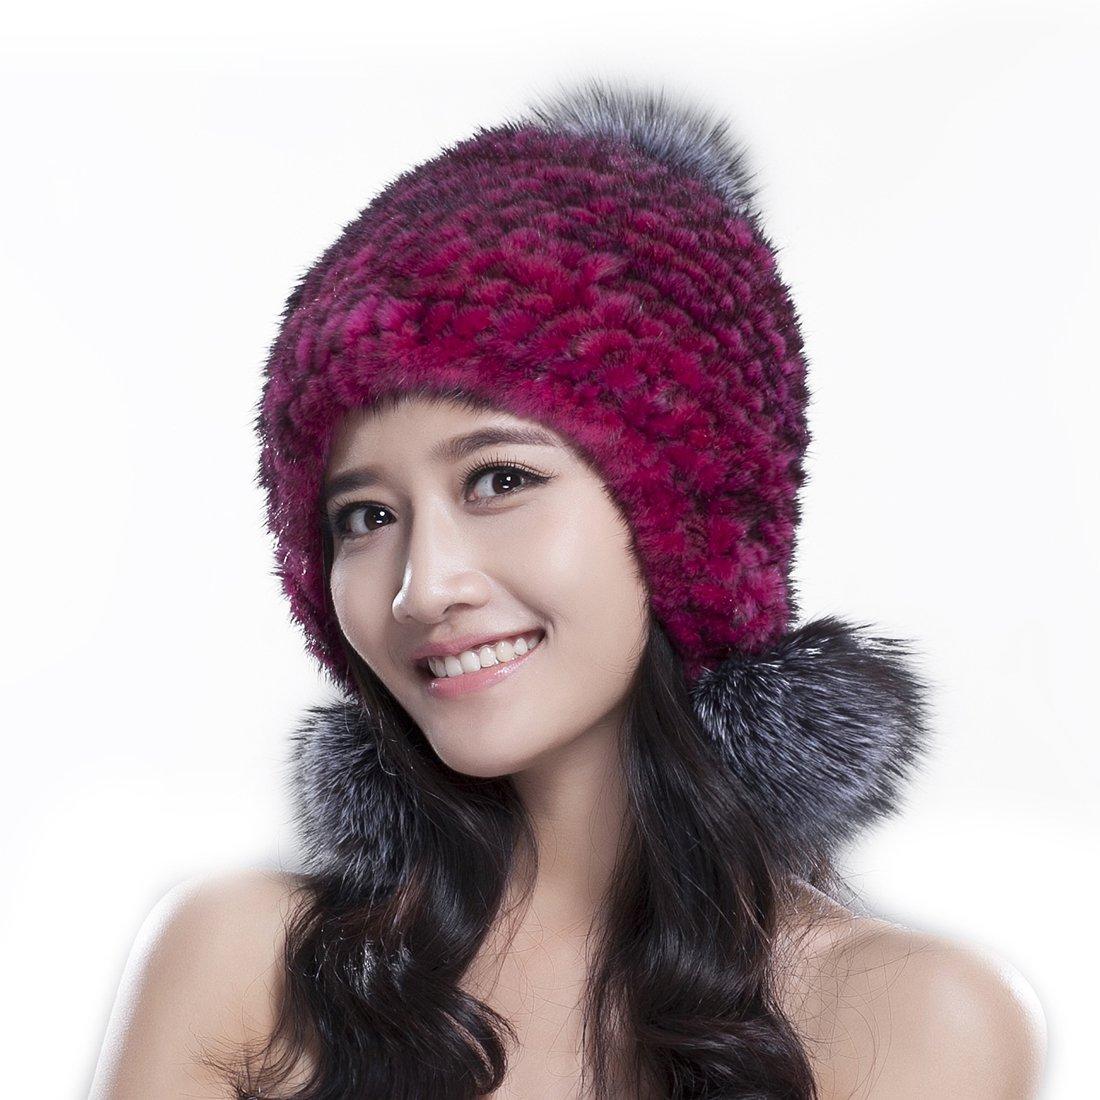 URSFUR Knit Mink Fur Bonnet Hat with Fox Fur Pom Poms (One Size Fits All, Rose Red)